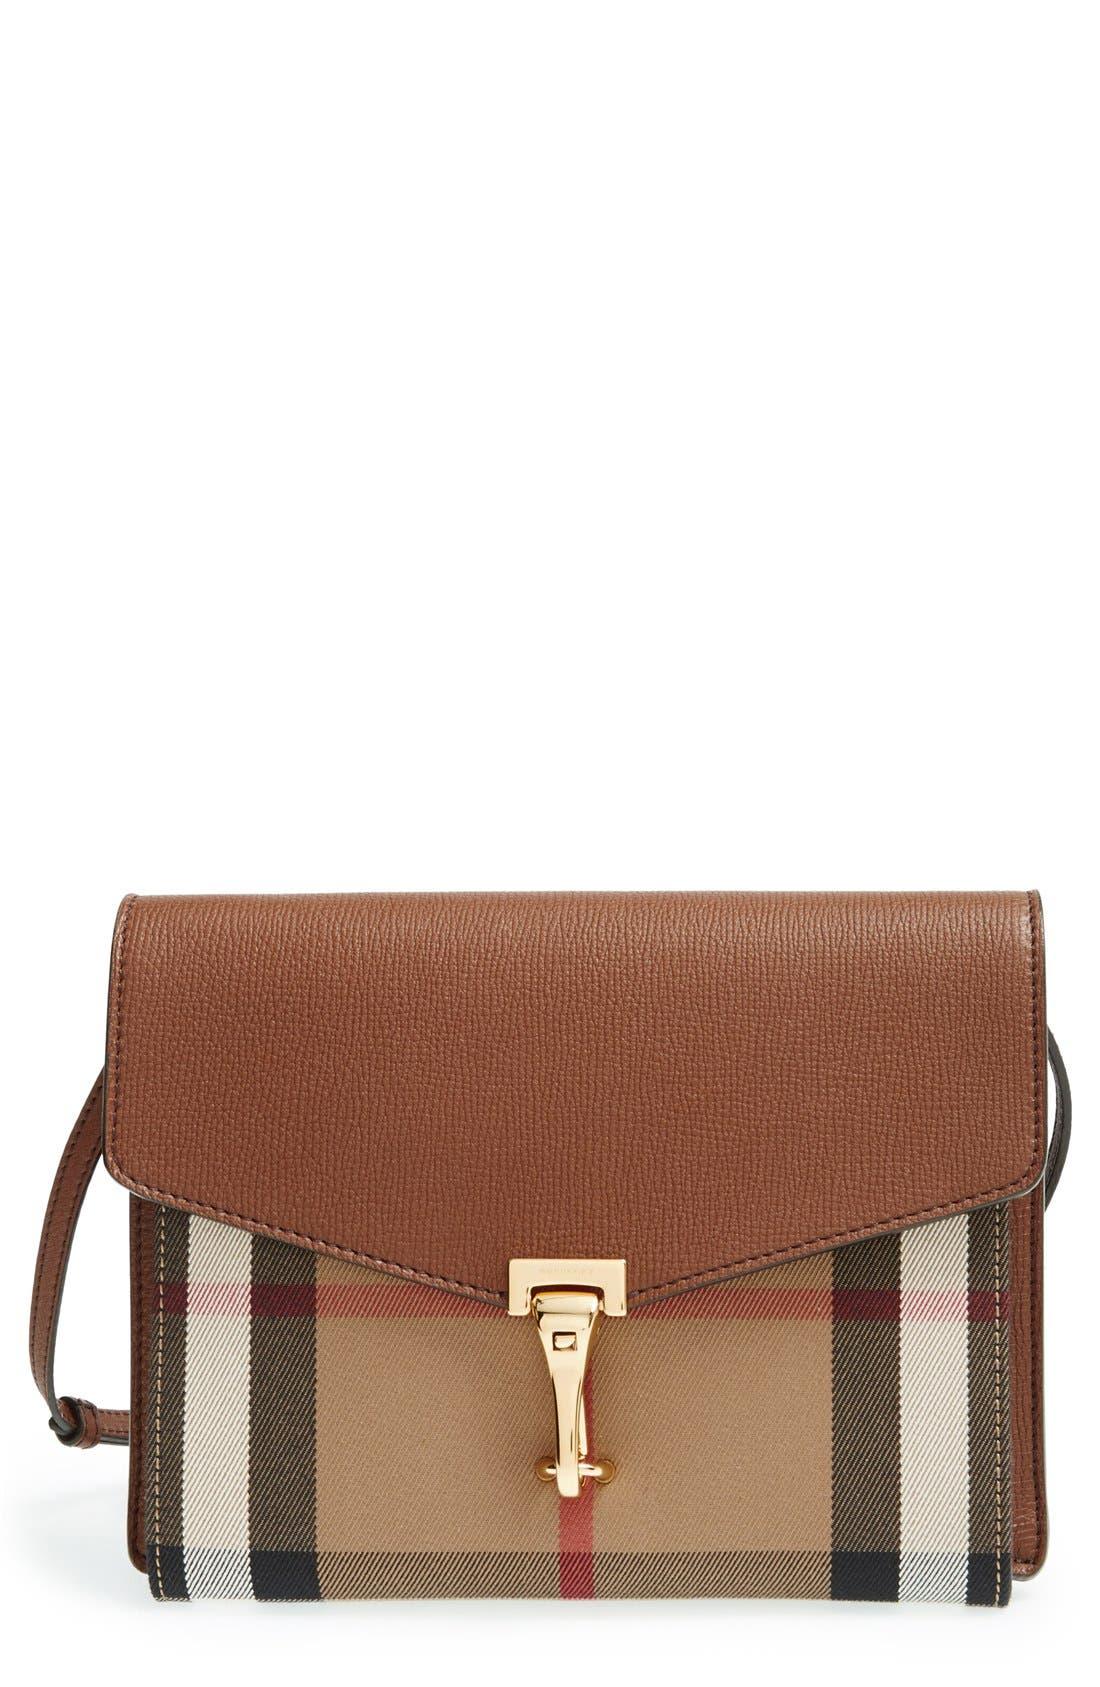 Burberry 'Small Macken' Check Crossbody Bag